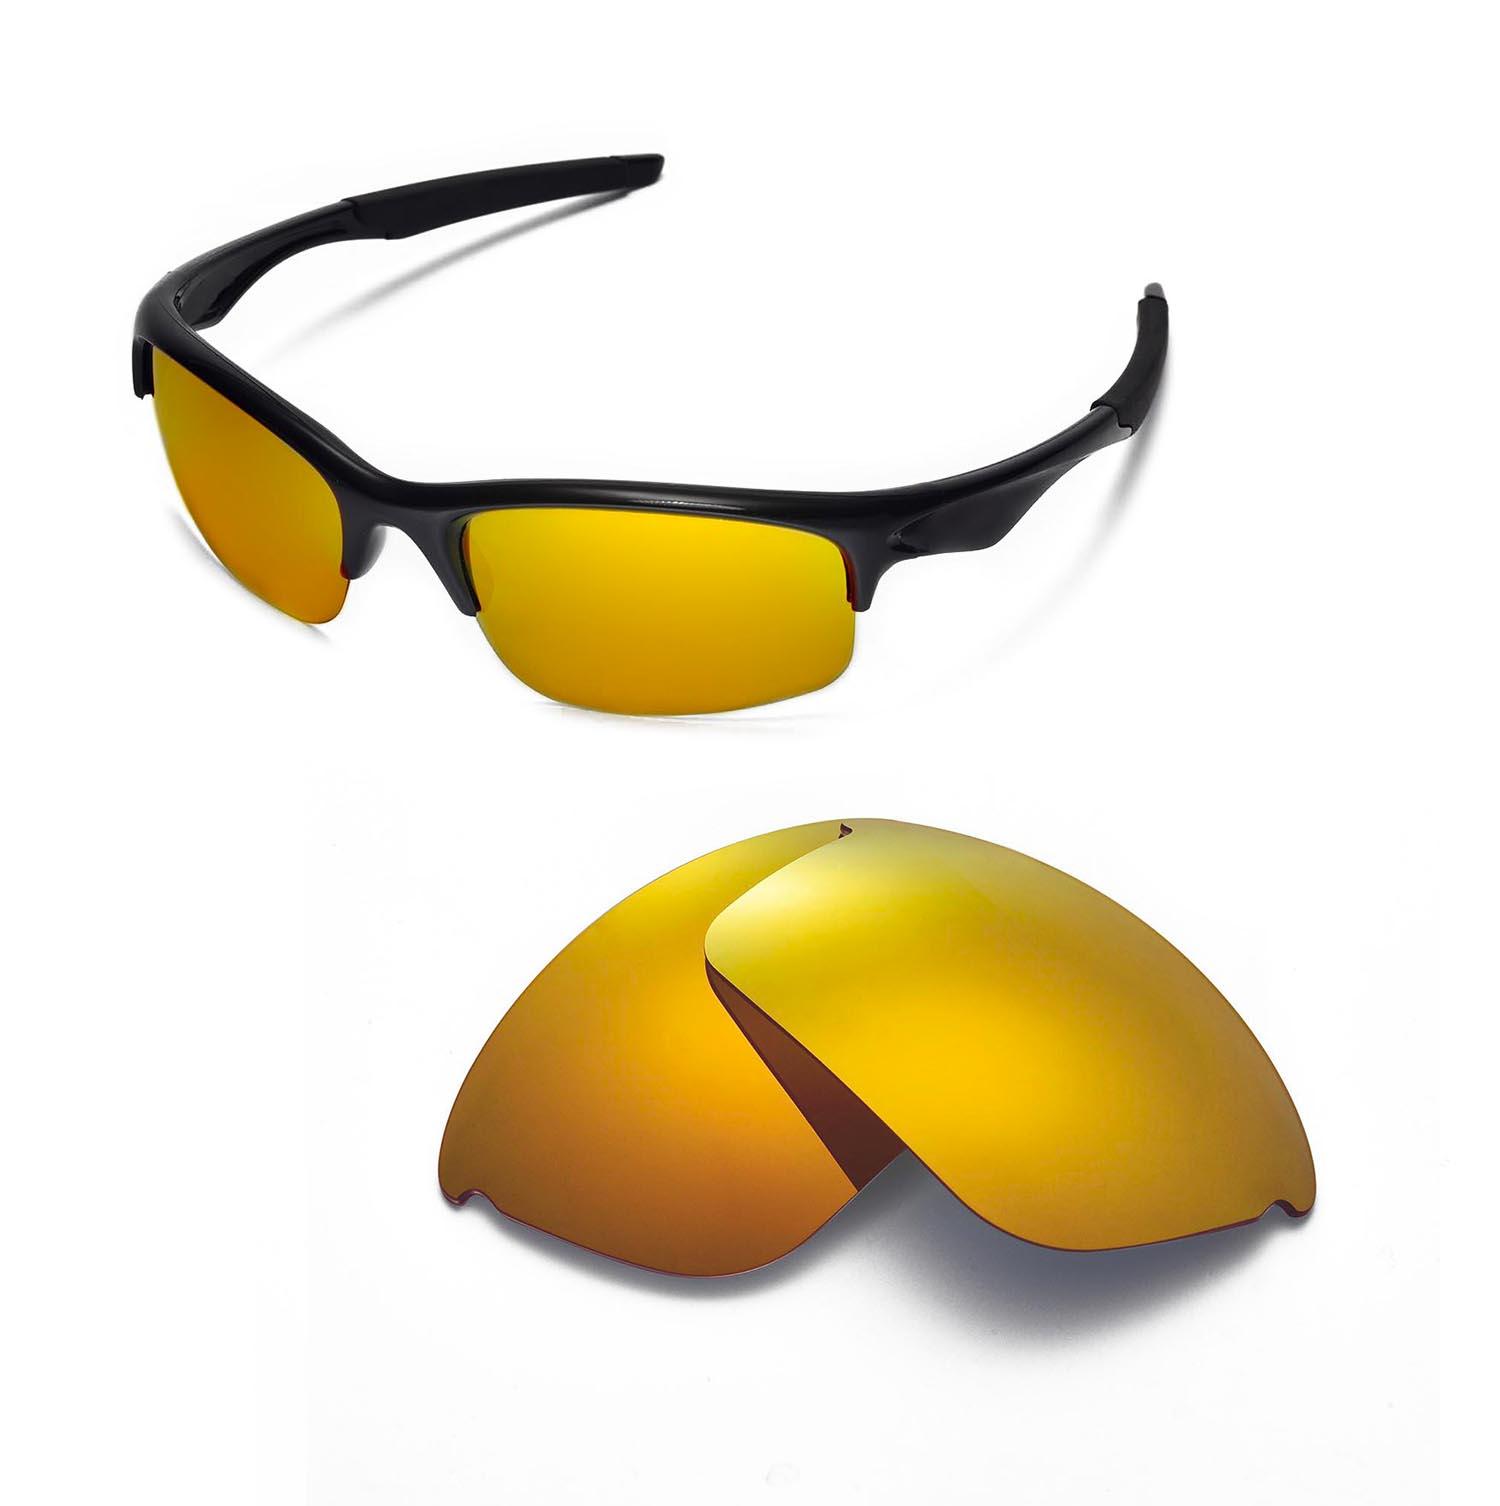 0f5a0e74ef Details about WL Polarized 24K Gold Replacement Lenses For Oakley Bottle  Rocket Sunglasses